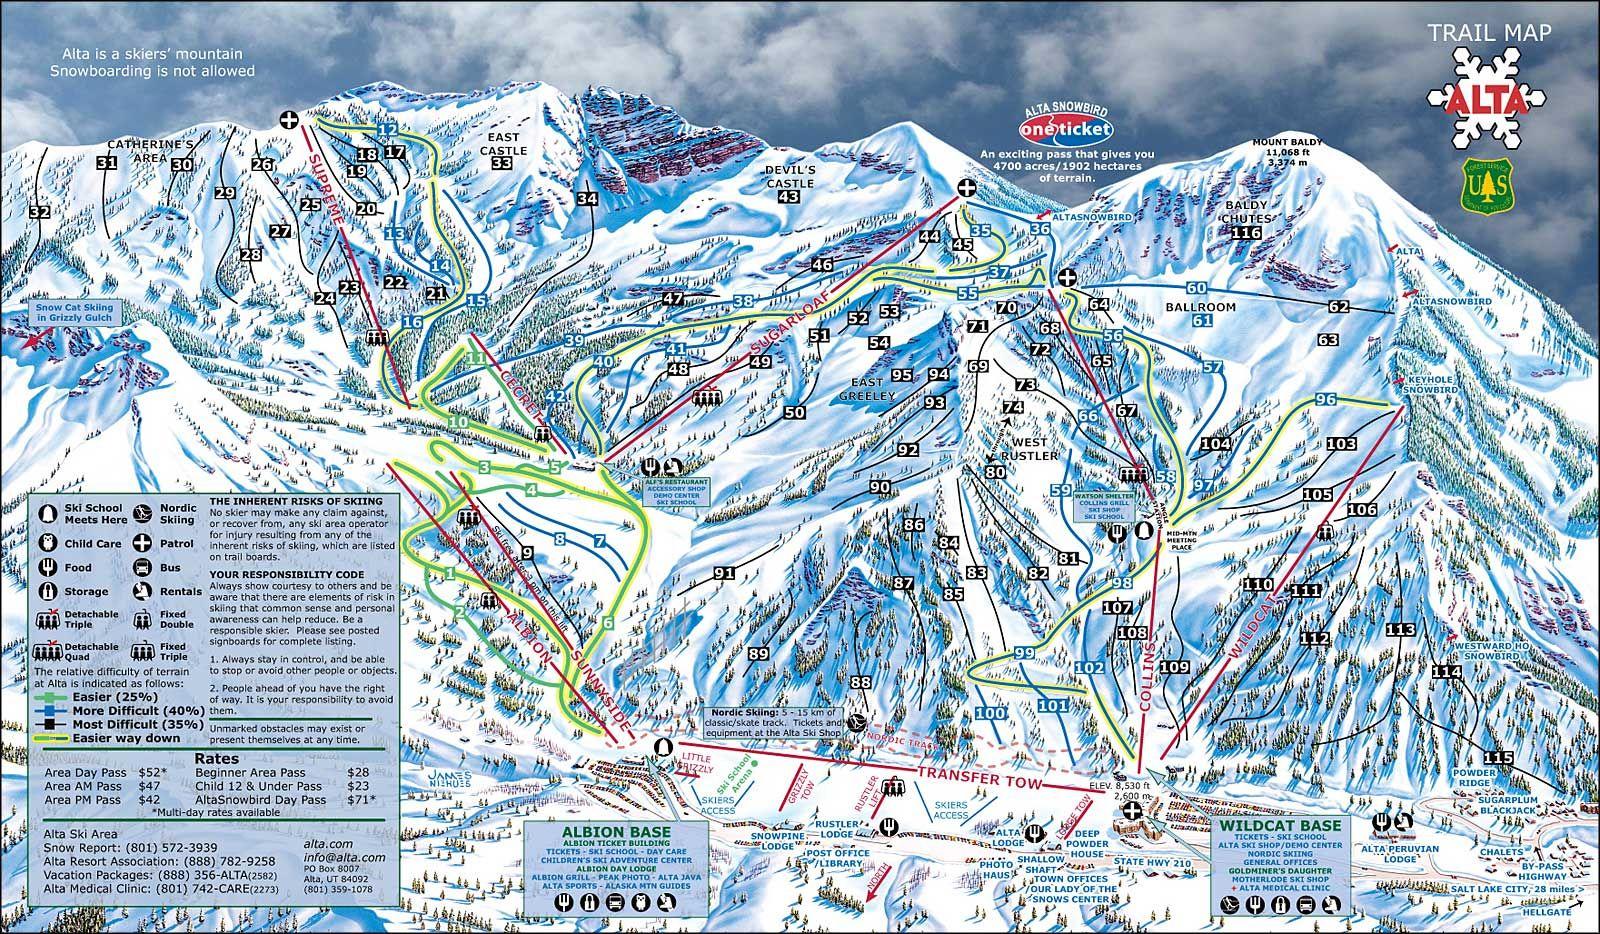 alta ski resort | alta ski resort, alta, utah | snow skiing in 2018